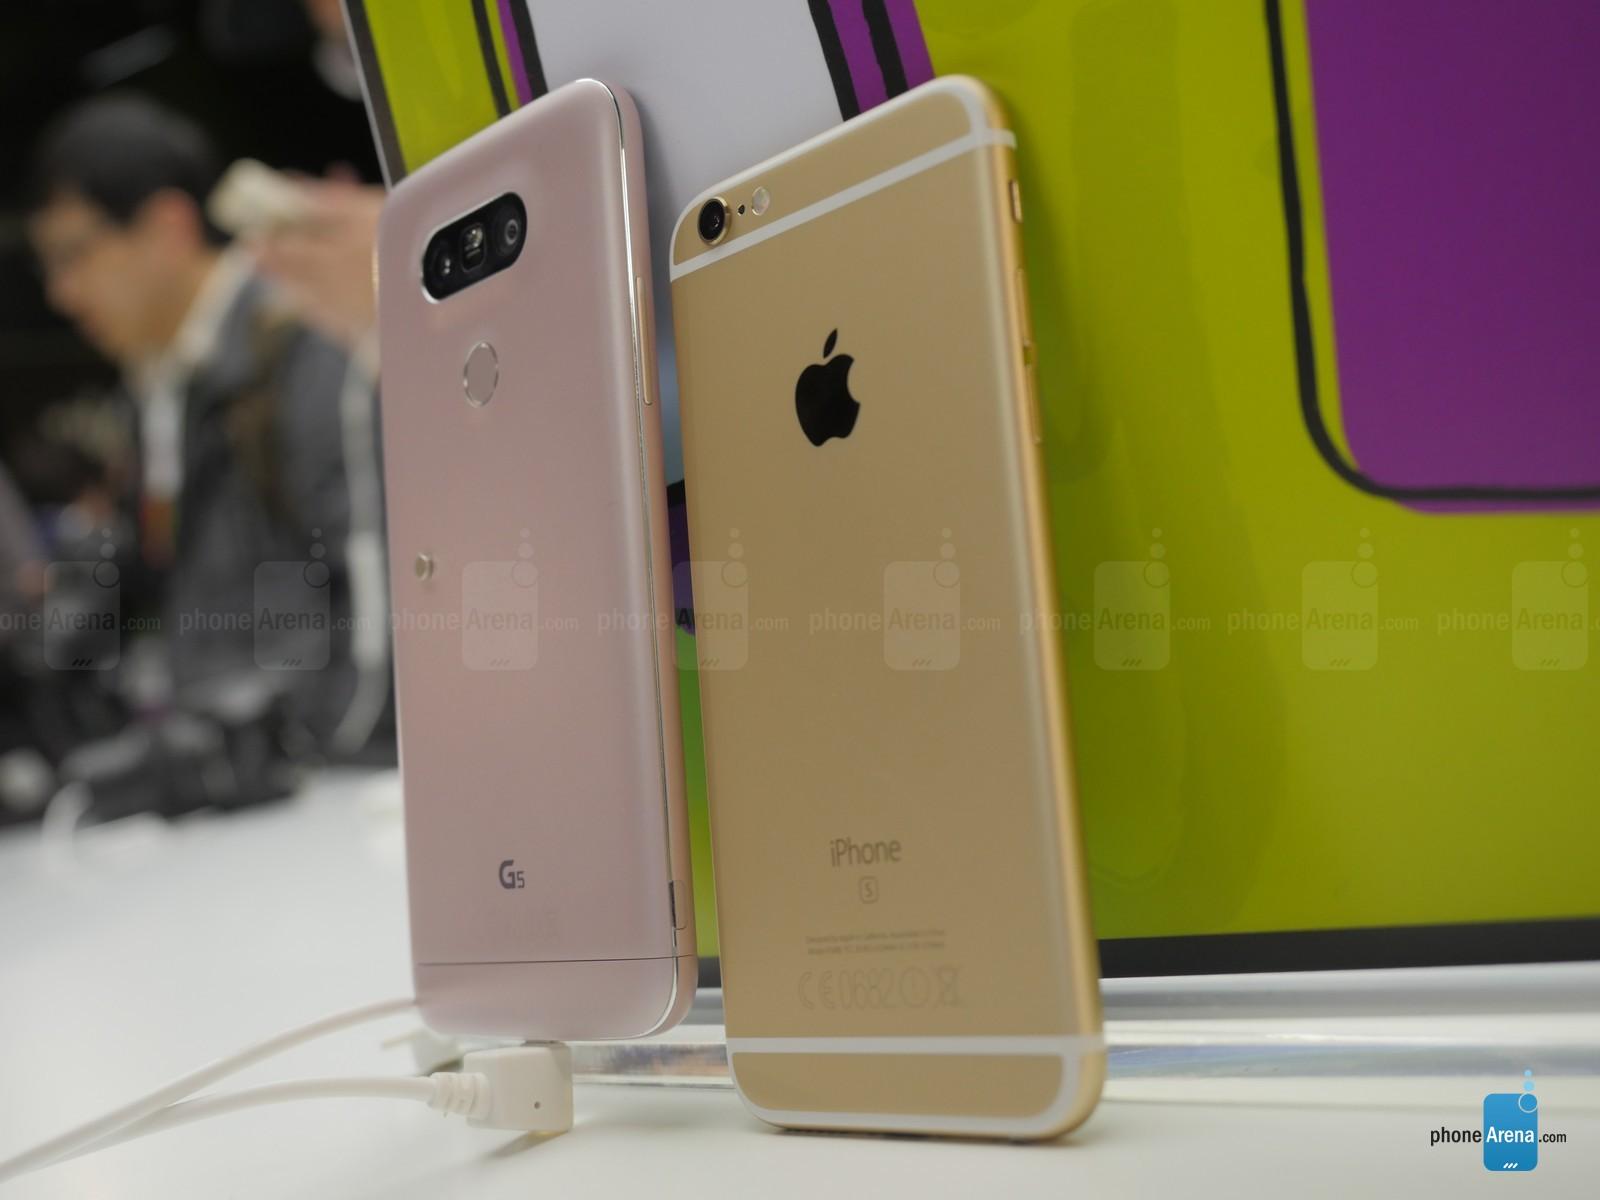 LG G5 vs iPhone 6S 11